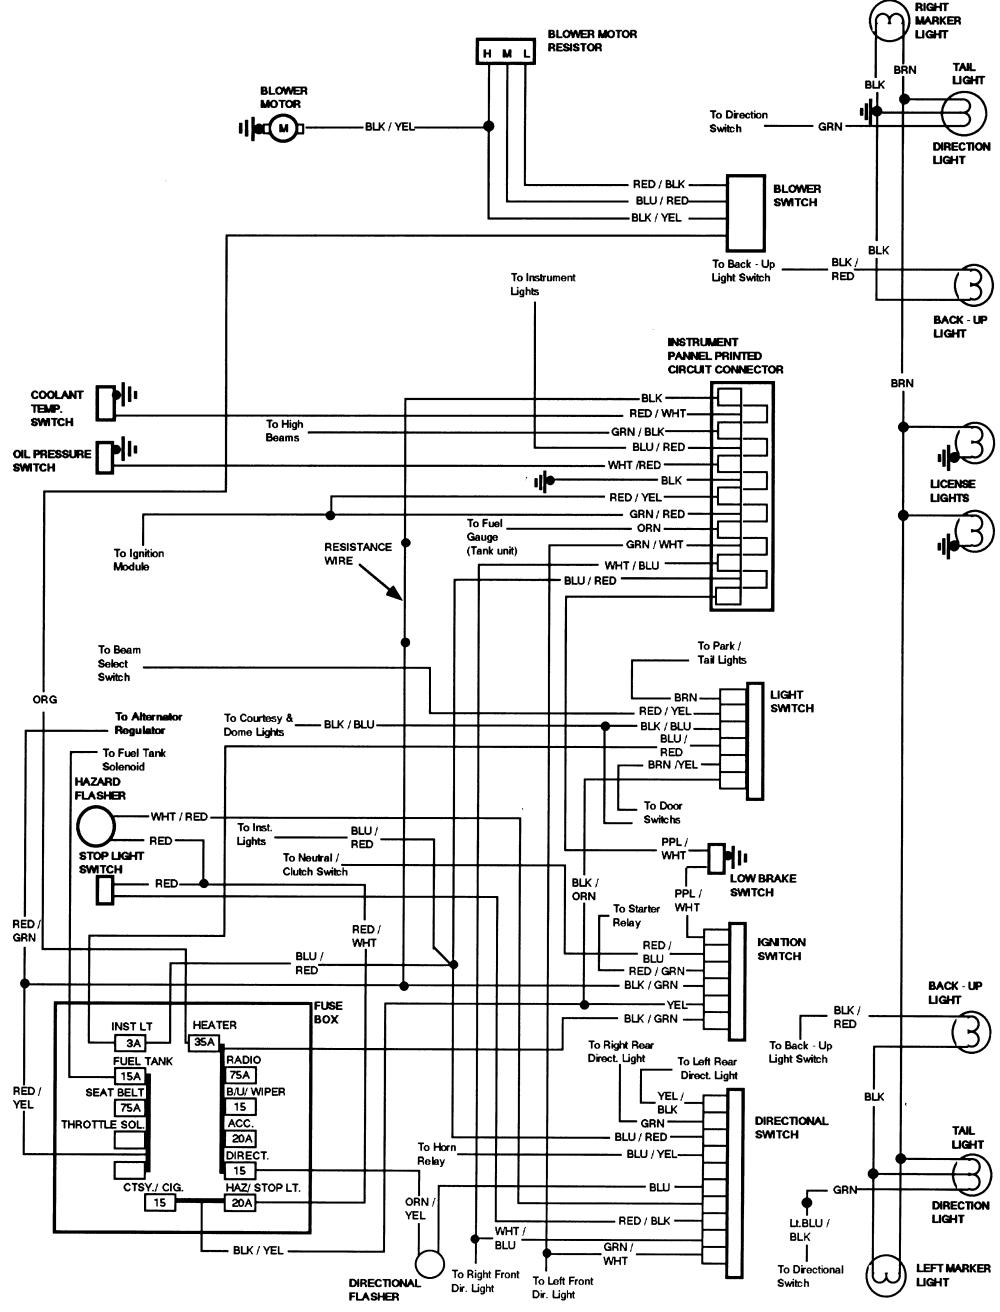 simplex wiring diagram